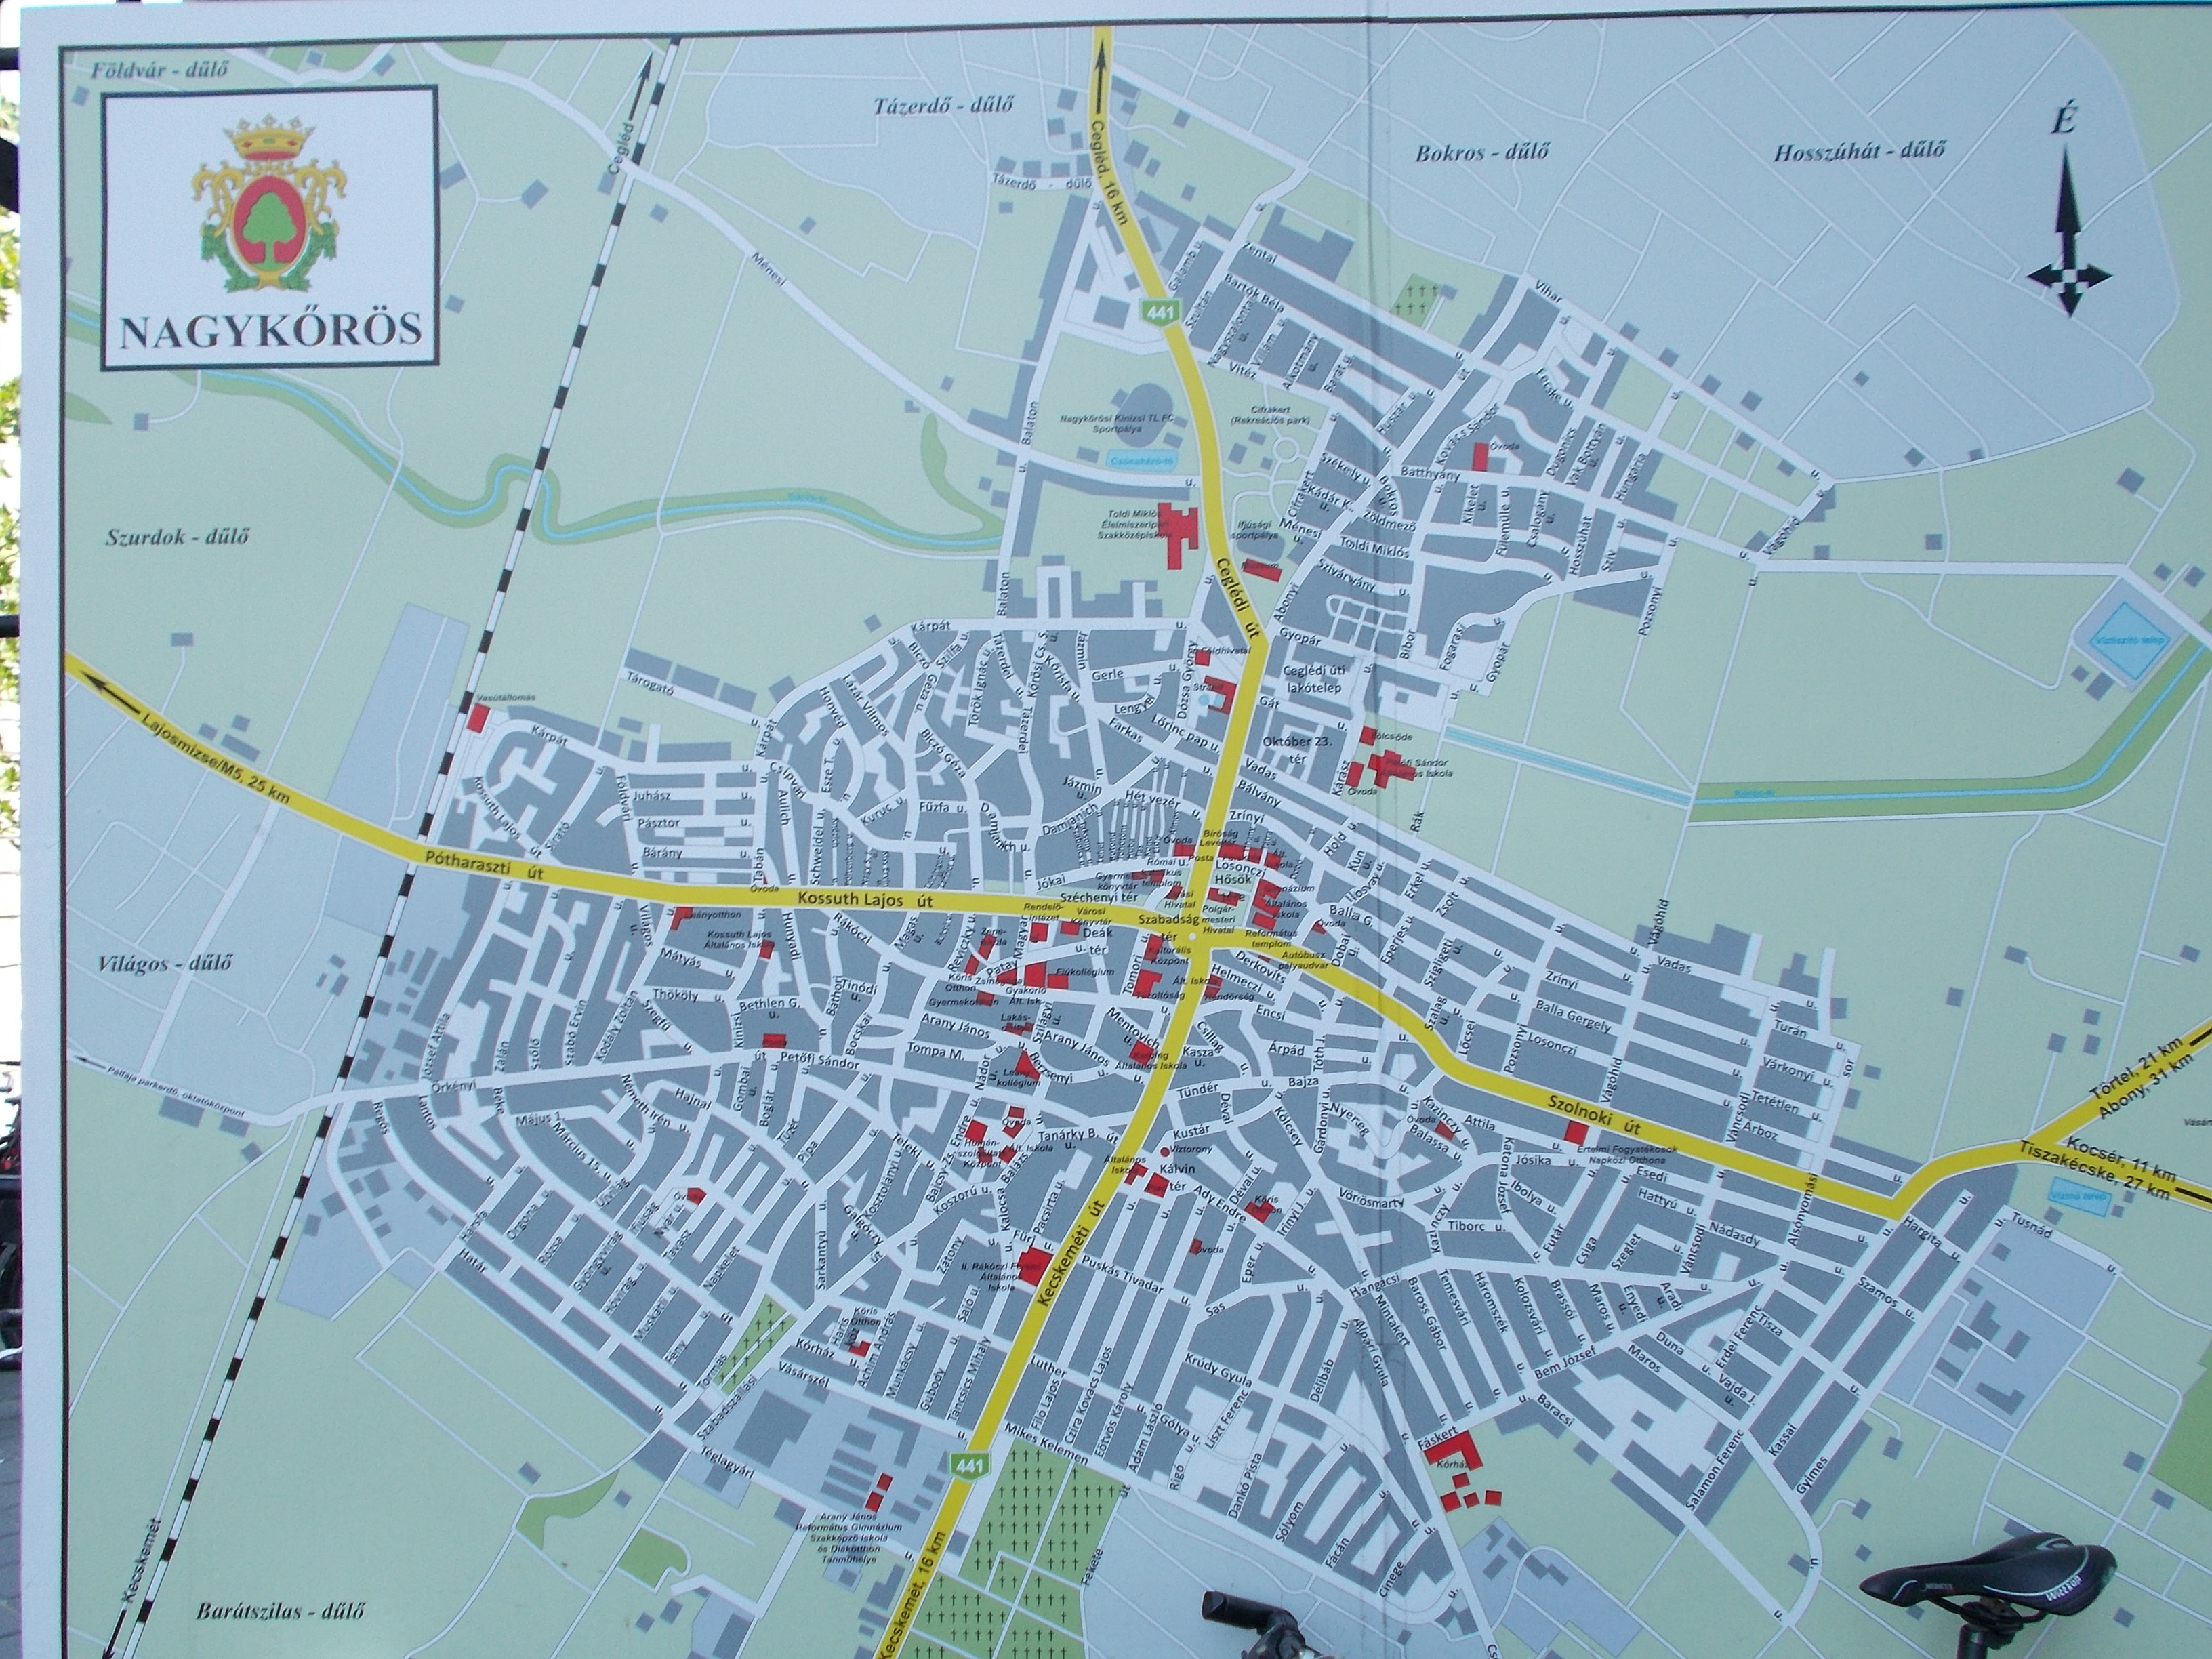 File City Map Nagykoros Hungary Jpg Wikimedia Commons